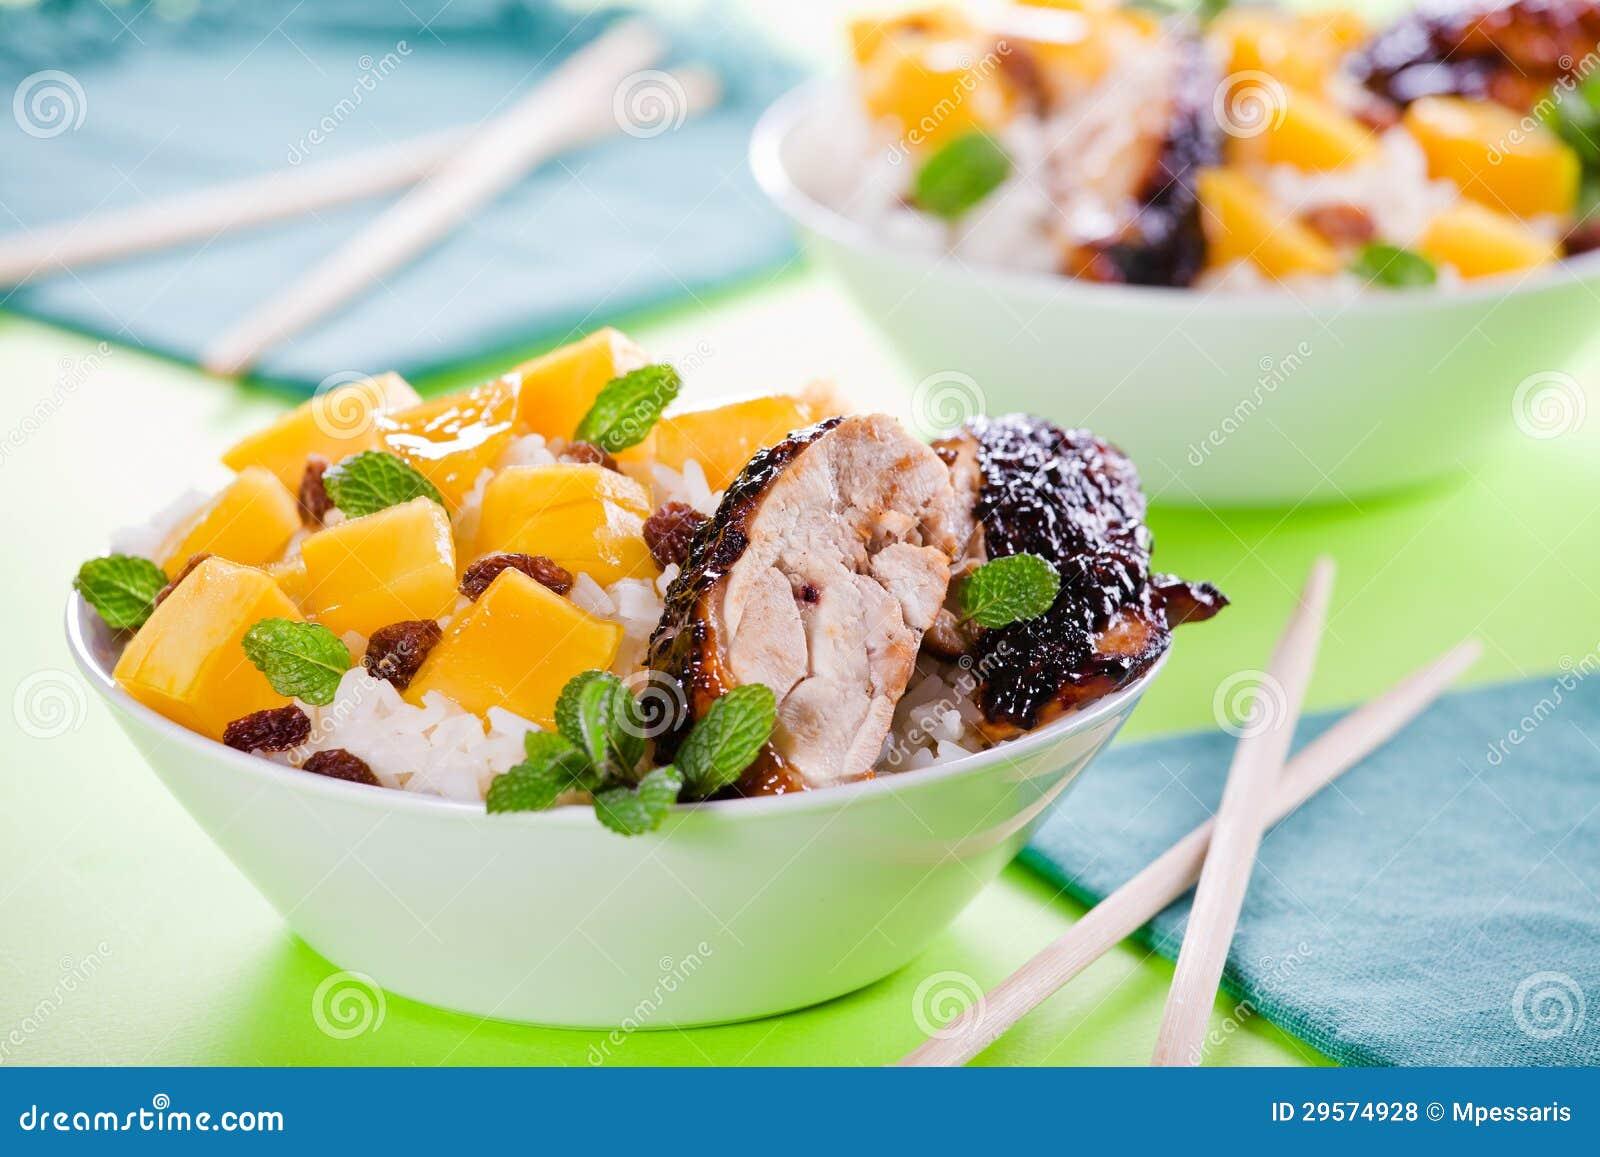 Carro Thai Food